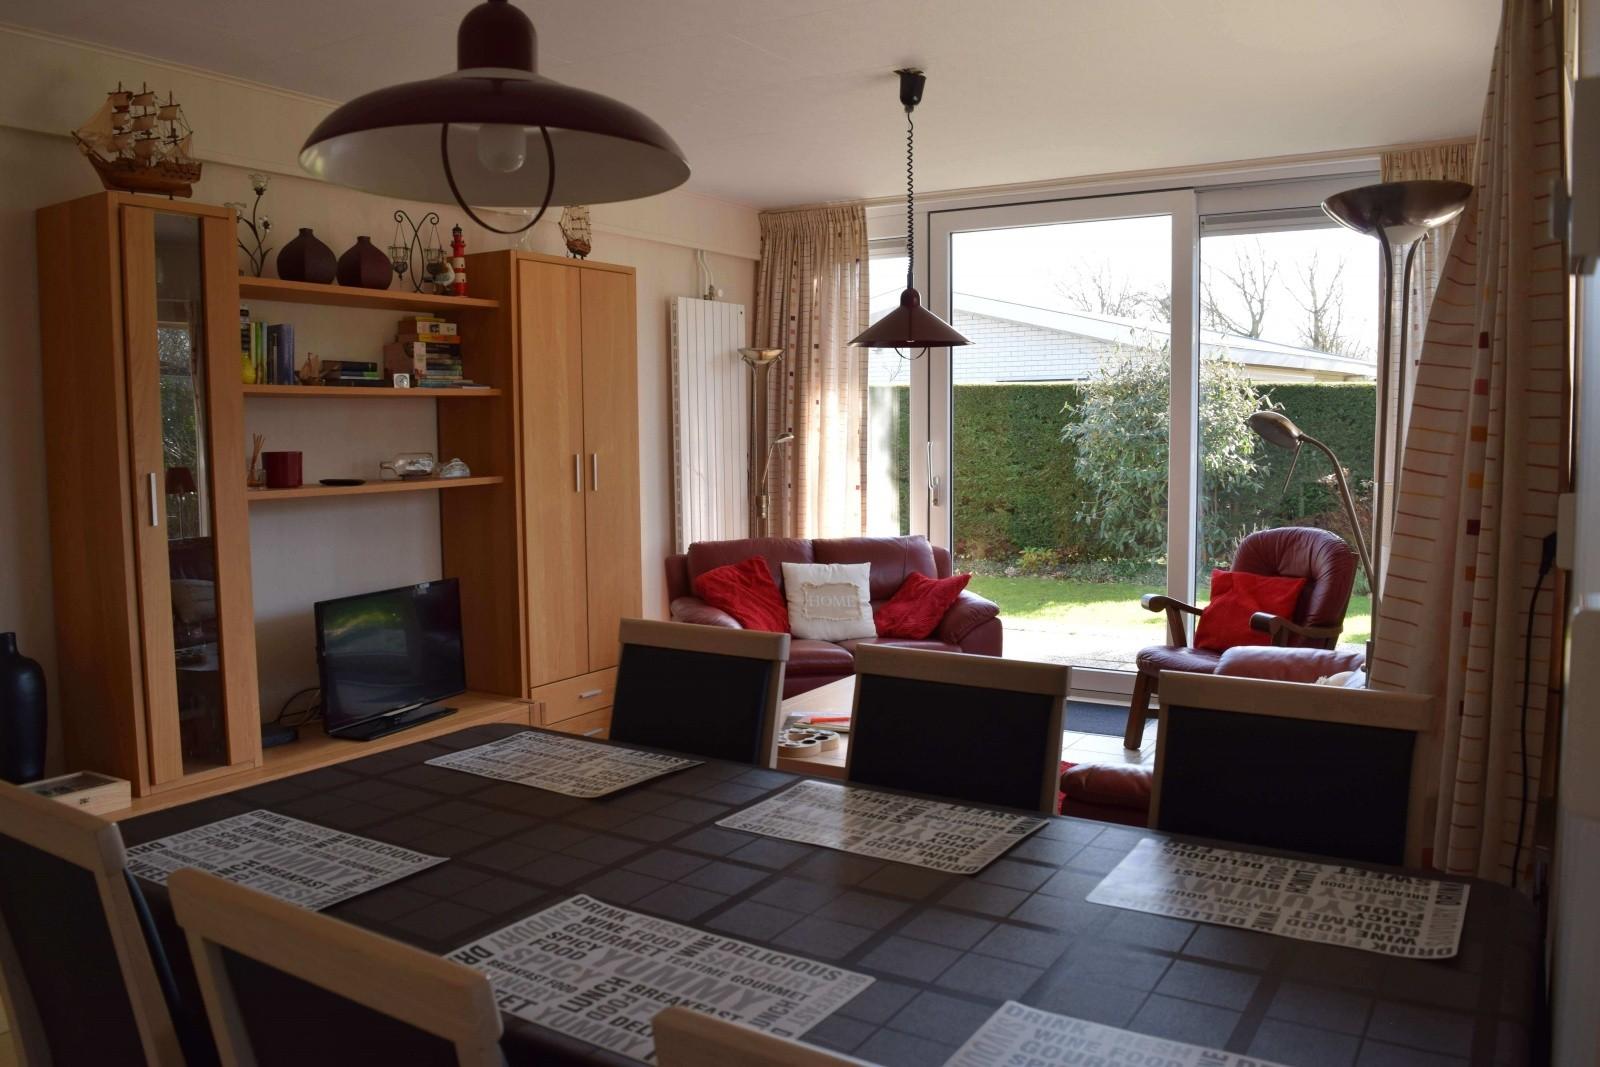 Woonkamer | Vakantiebungalow Joossesweg 65, Westkapelle